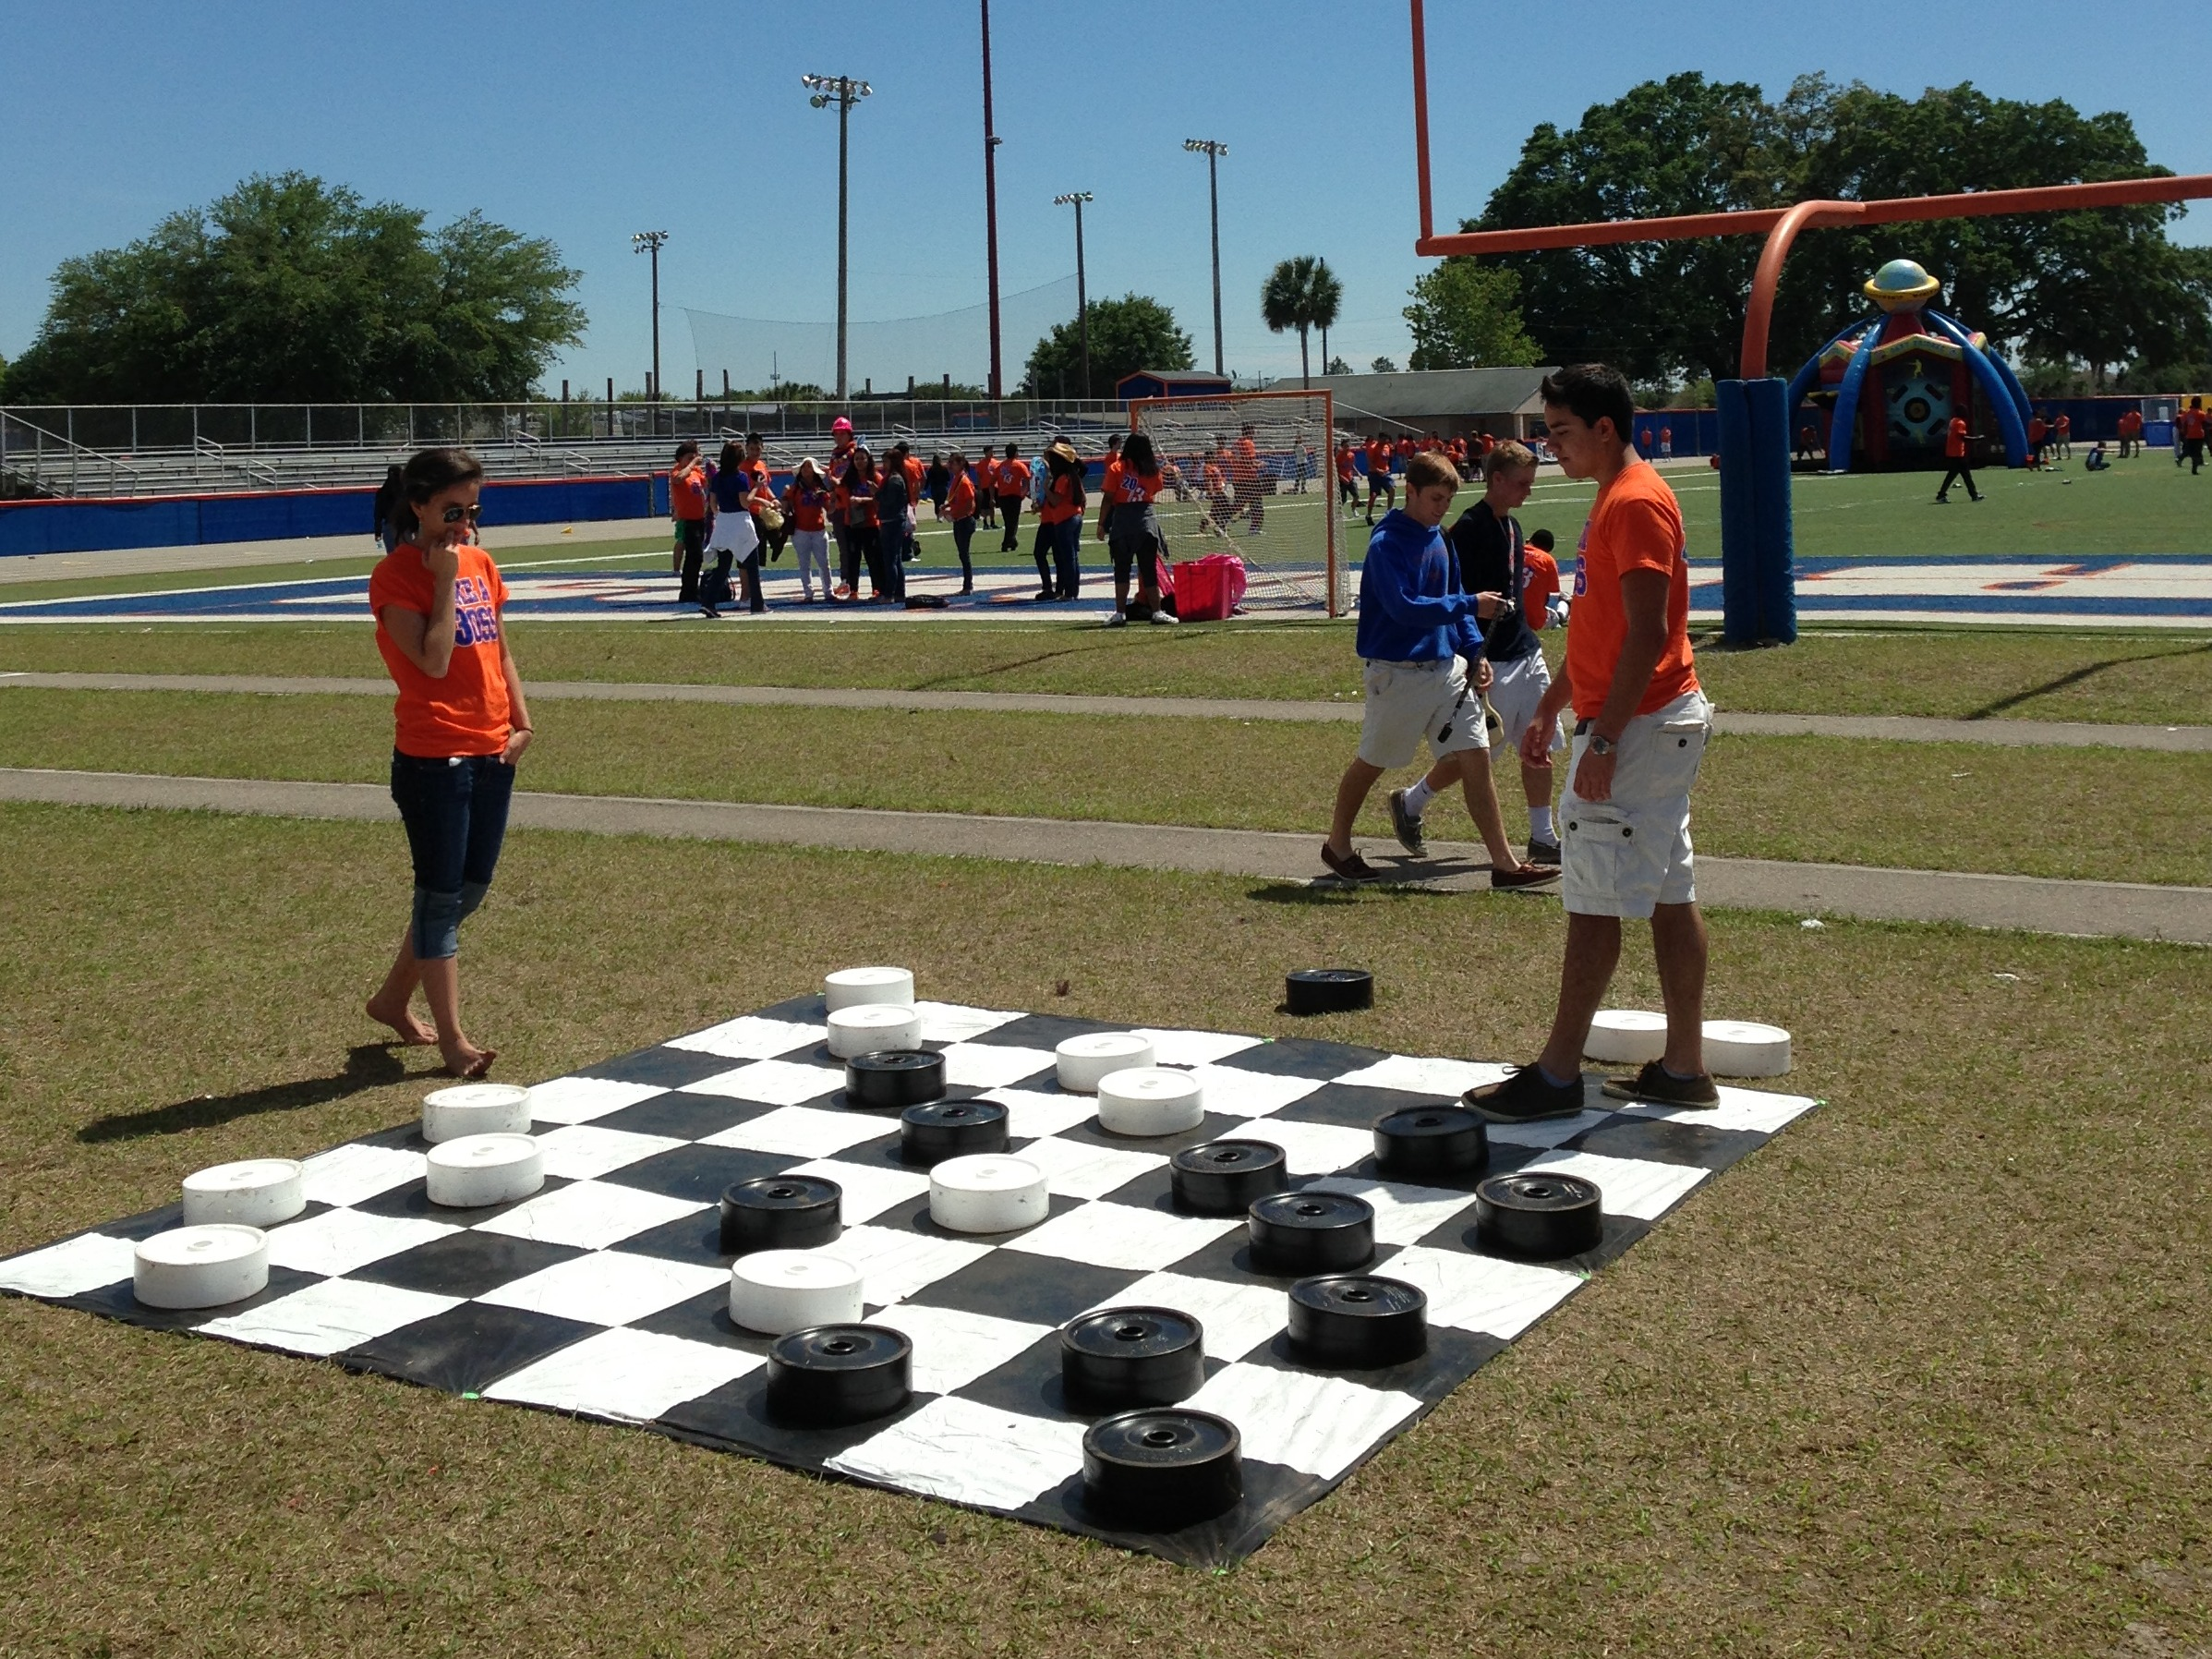 Games Winter Park Amp Orlando Fl No Limit Event Rentals